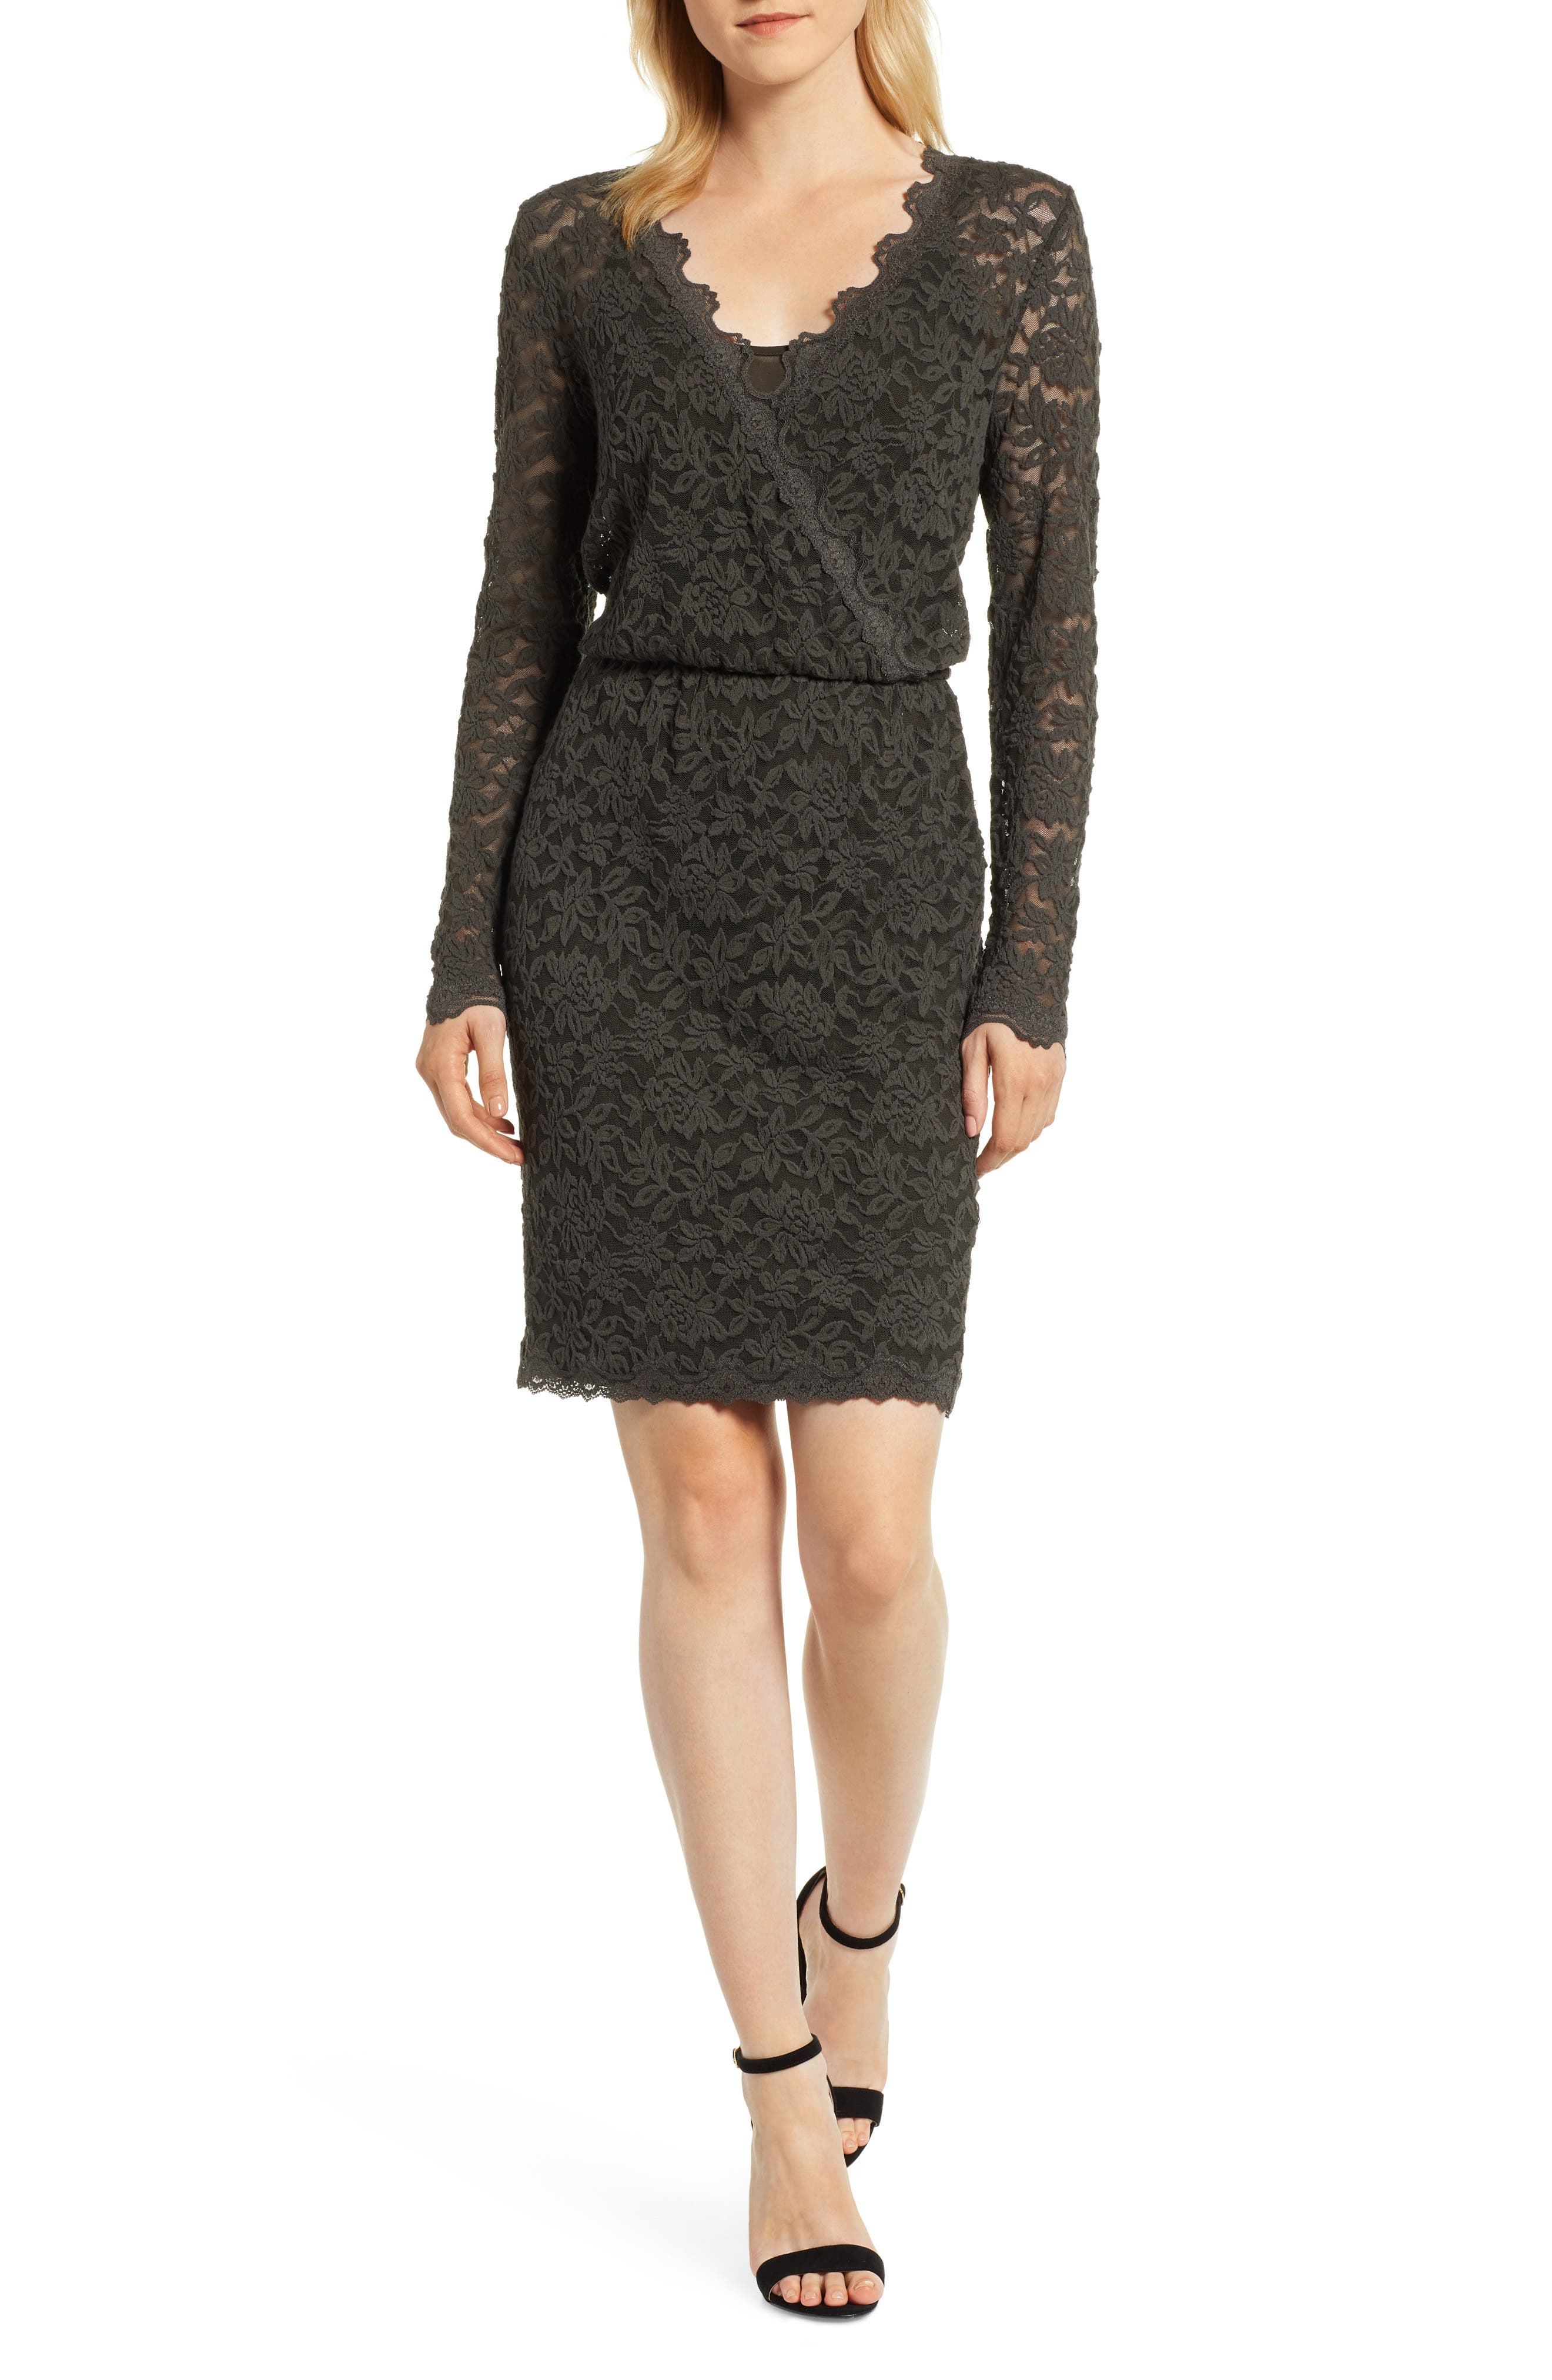 ROSEMUNDE Delicia Scallop Detail Cotton Blend Lace Dress, Main, color, DARK FOREST